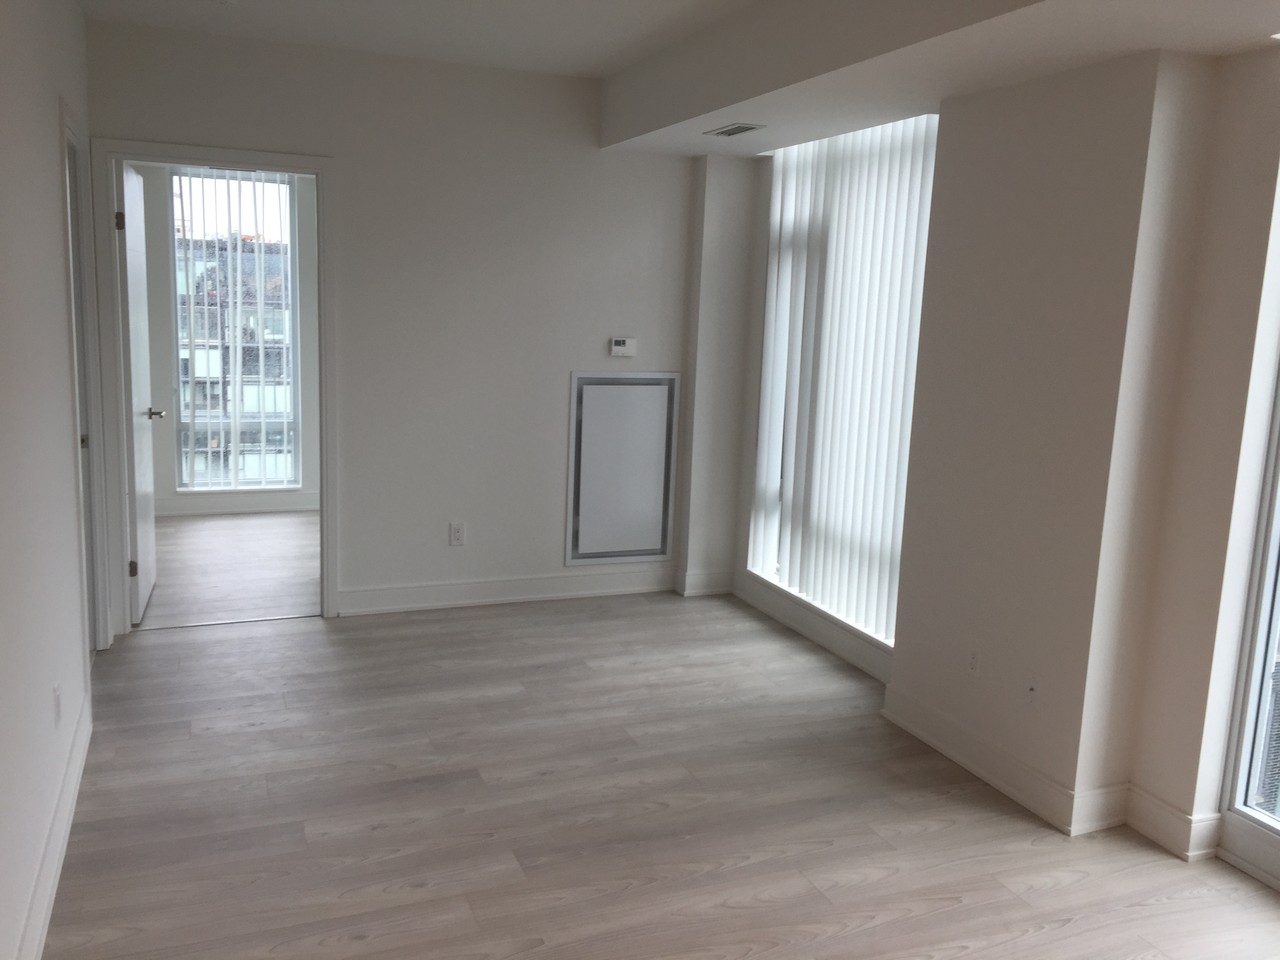 525 Adelaide St W Toronto On M5v 2 Bedroom Apartment For Rent